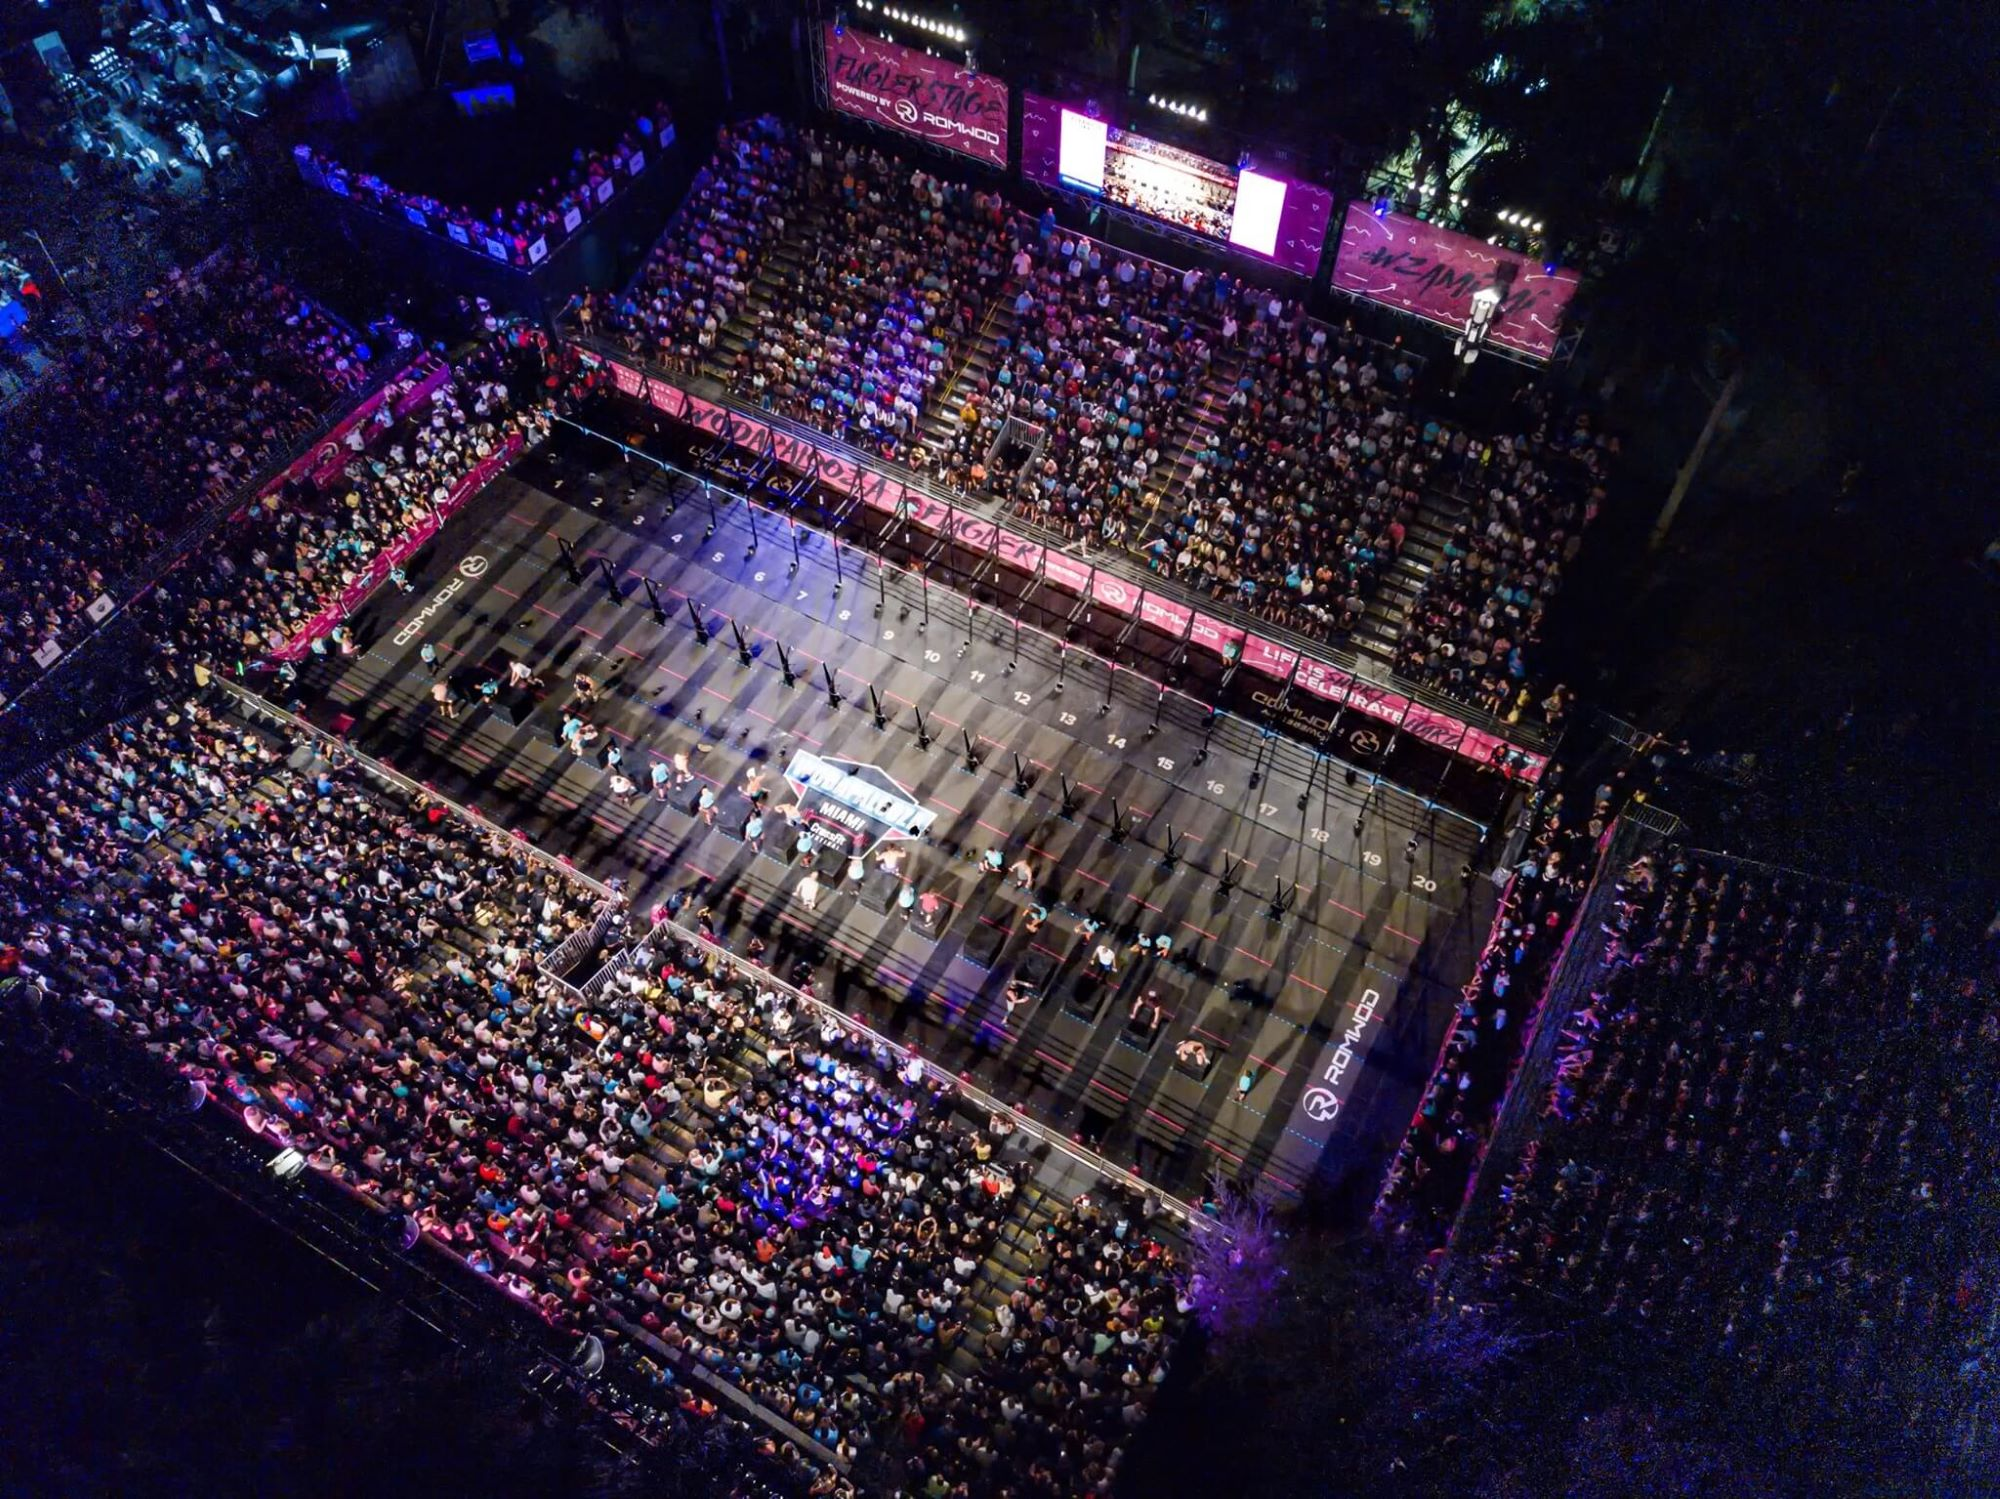 Aerial photo of WODAPALOOZA main competition area